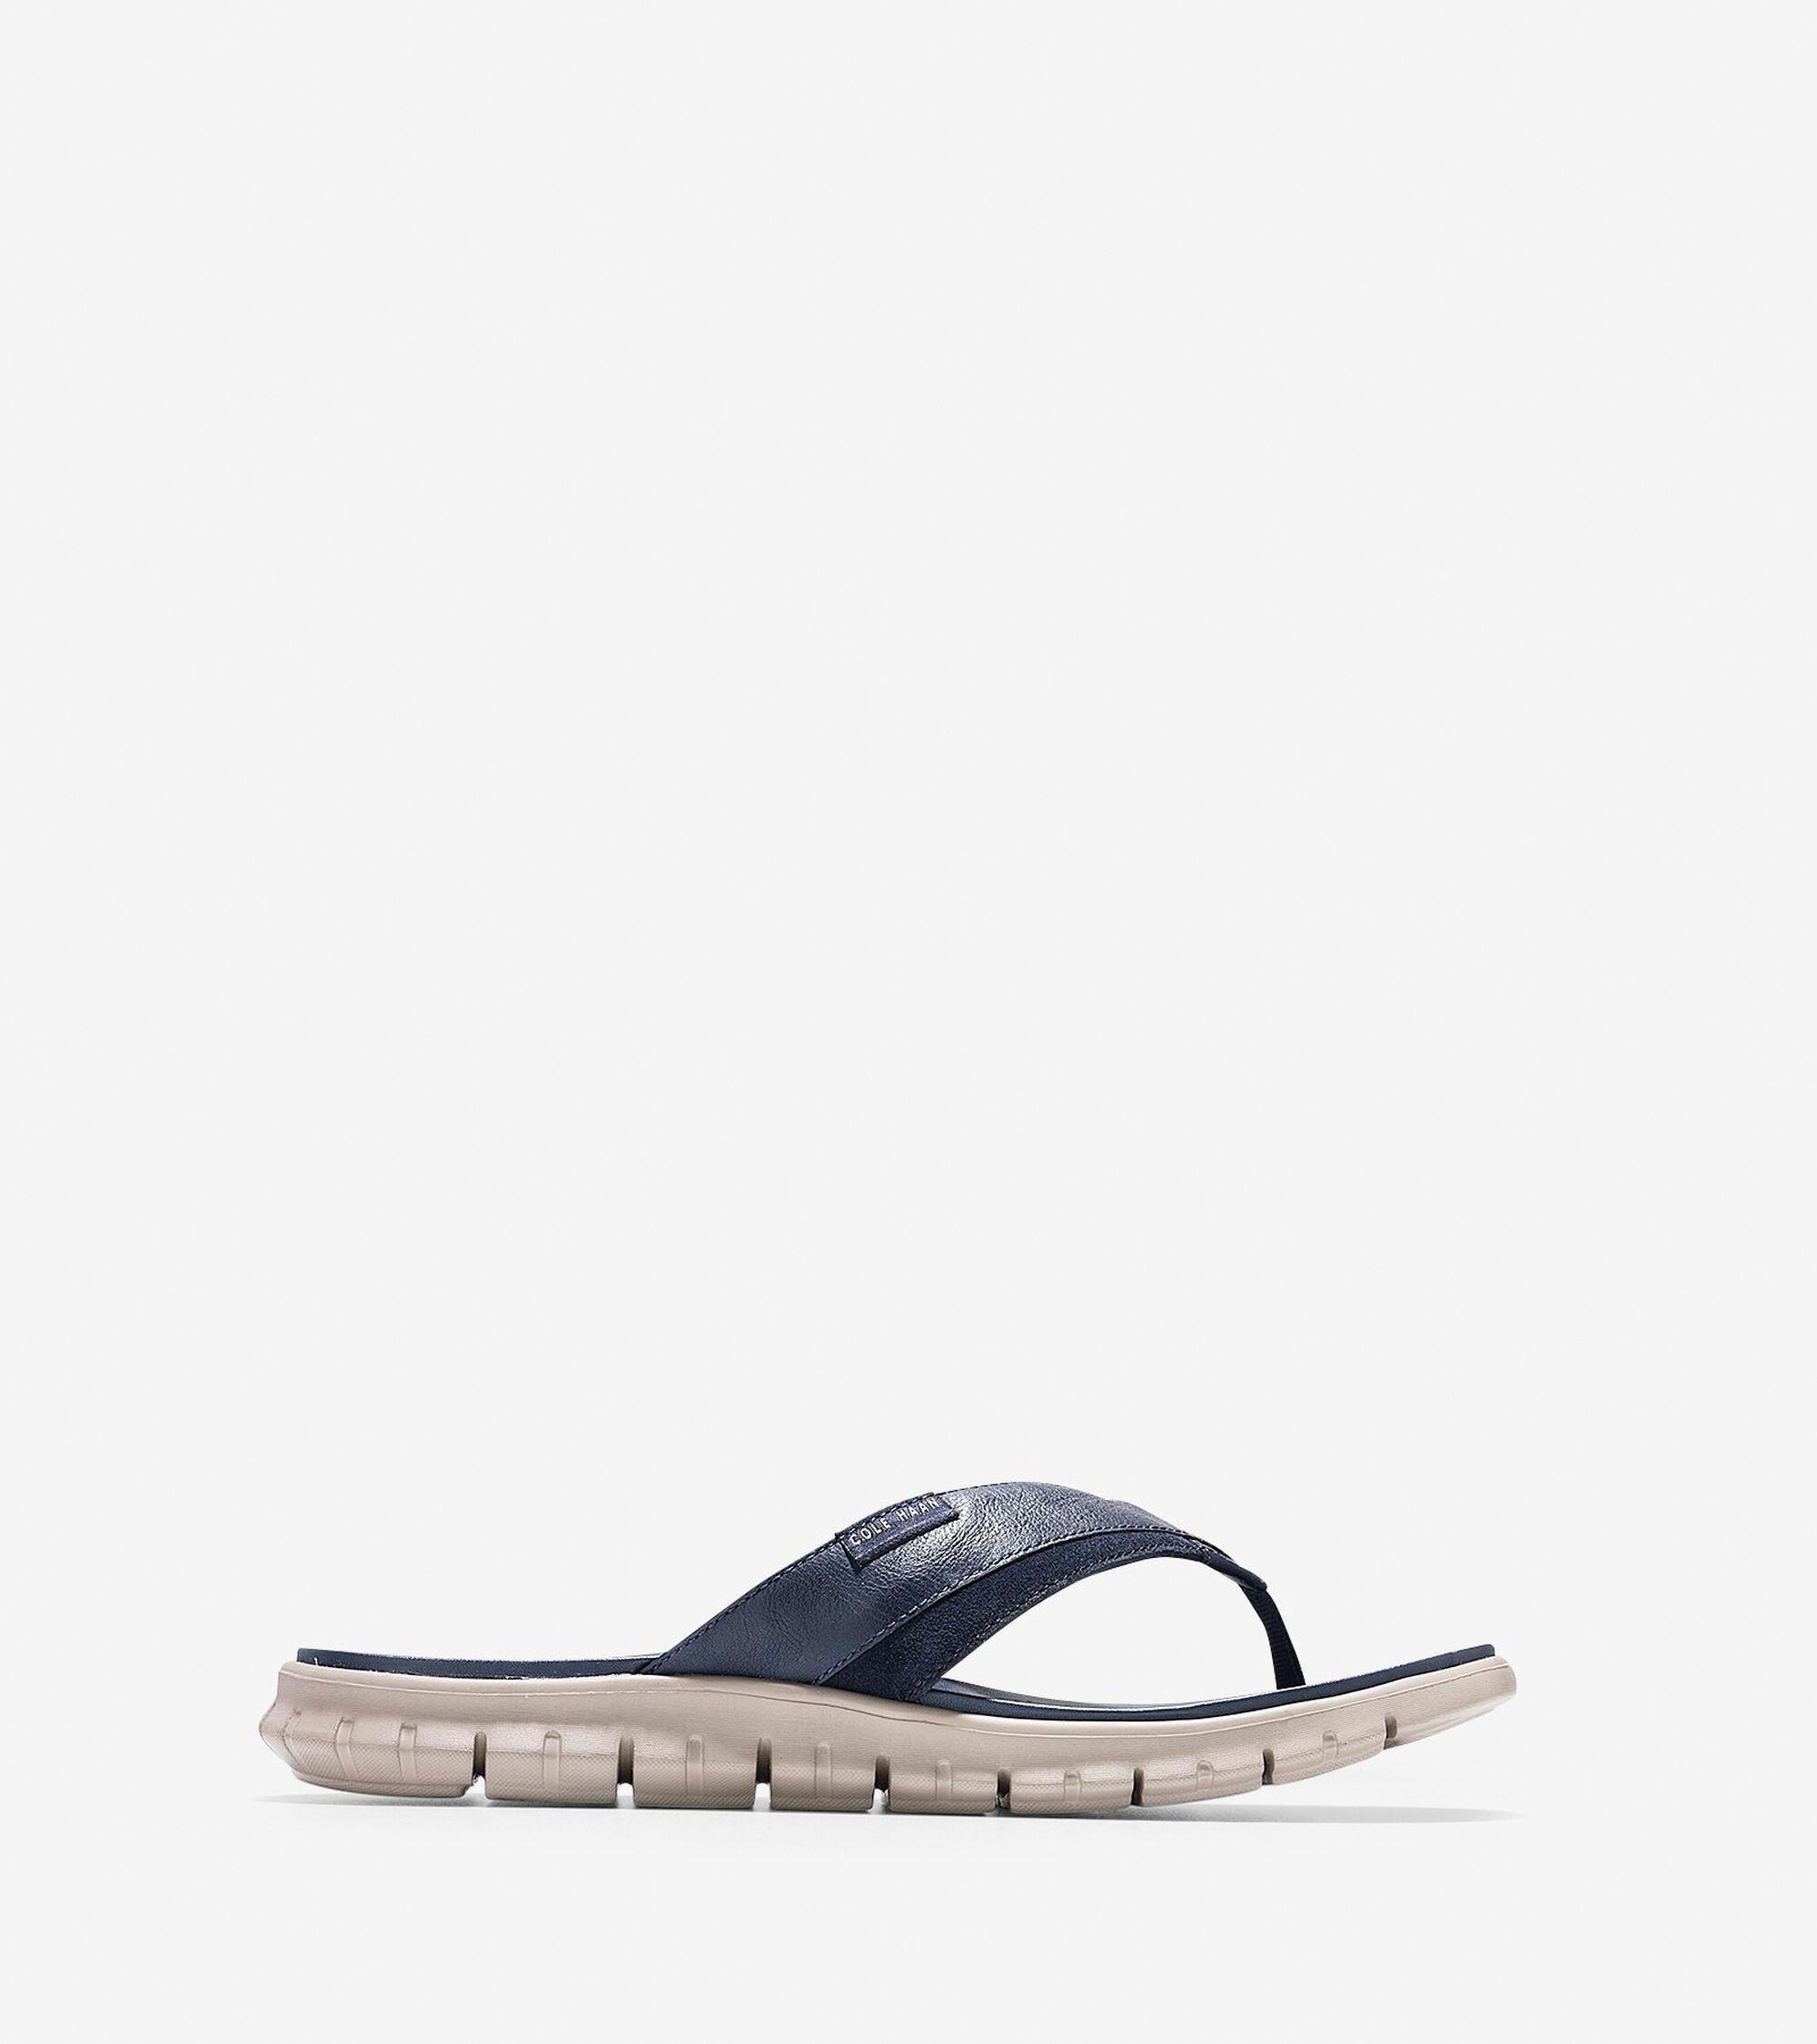 3a08a618e4e14a ZEROGRAND Fold Thong Sandals in Marine Blue